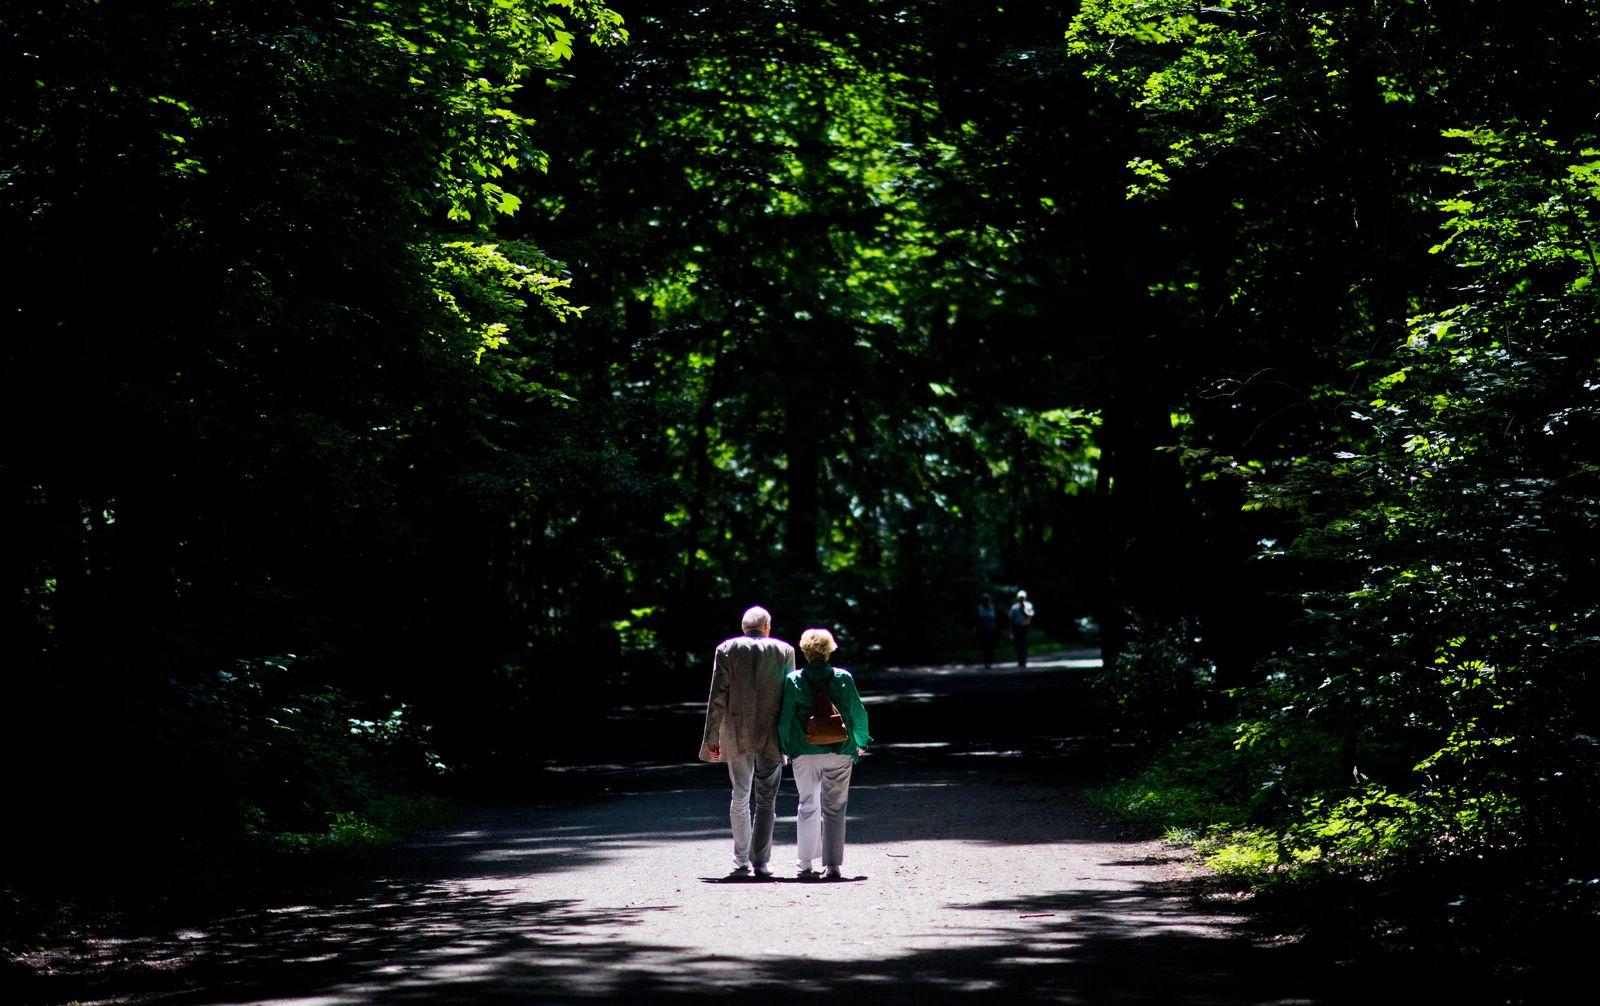 Rentner / Älteres Paar